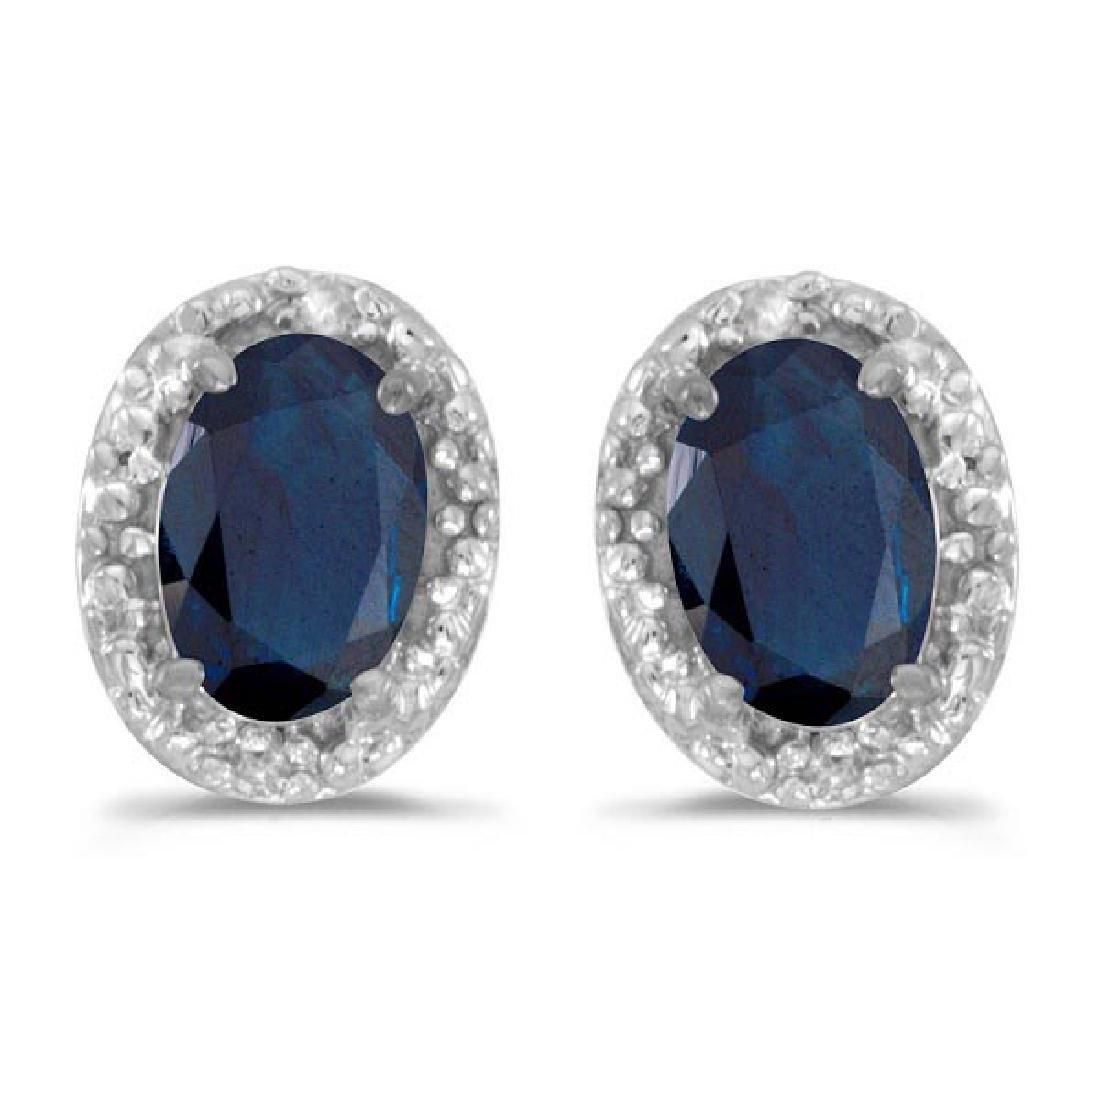 Diamond and Blue Sapphire Earrings 14k White Gold (1.20